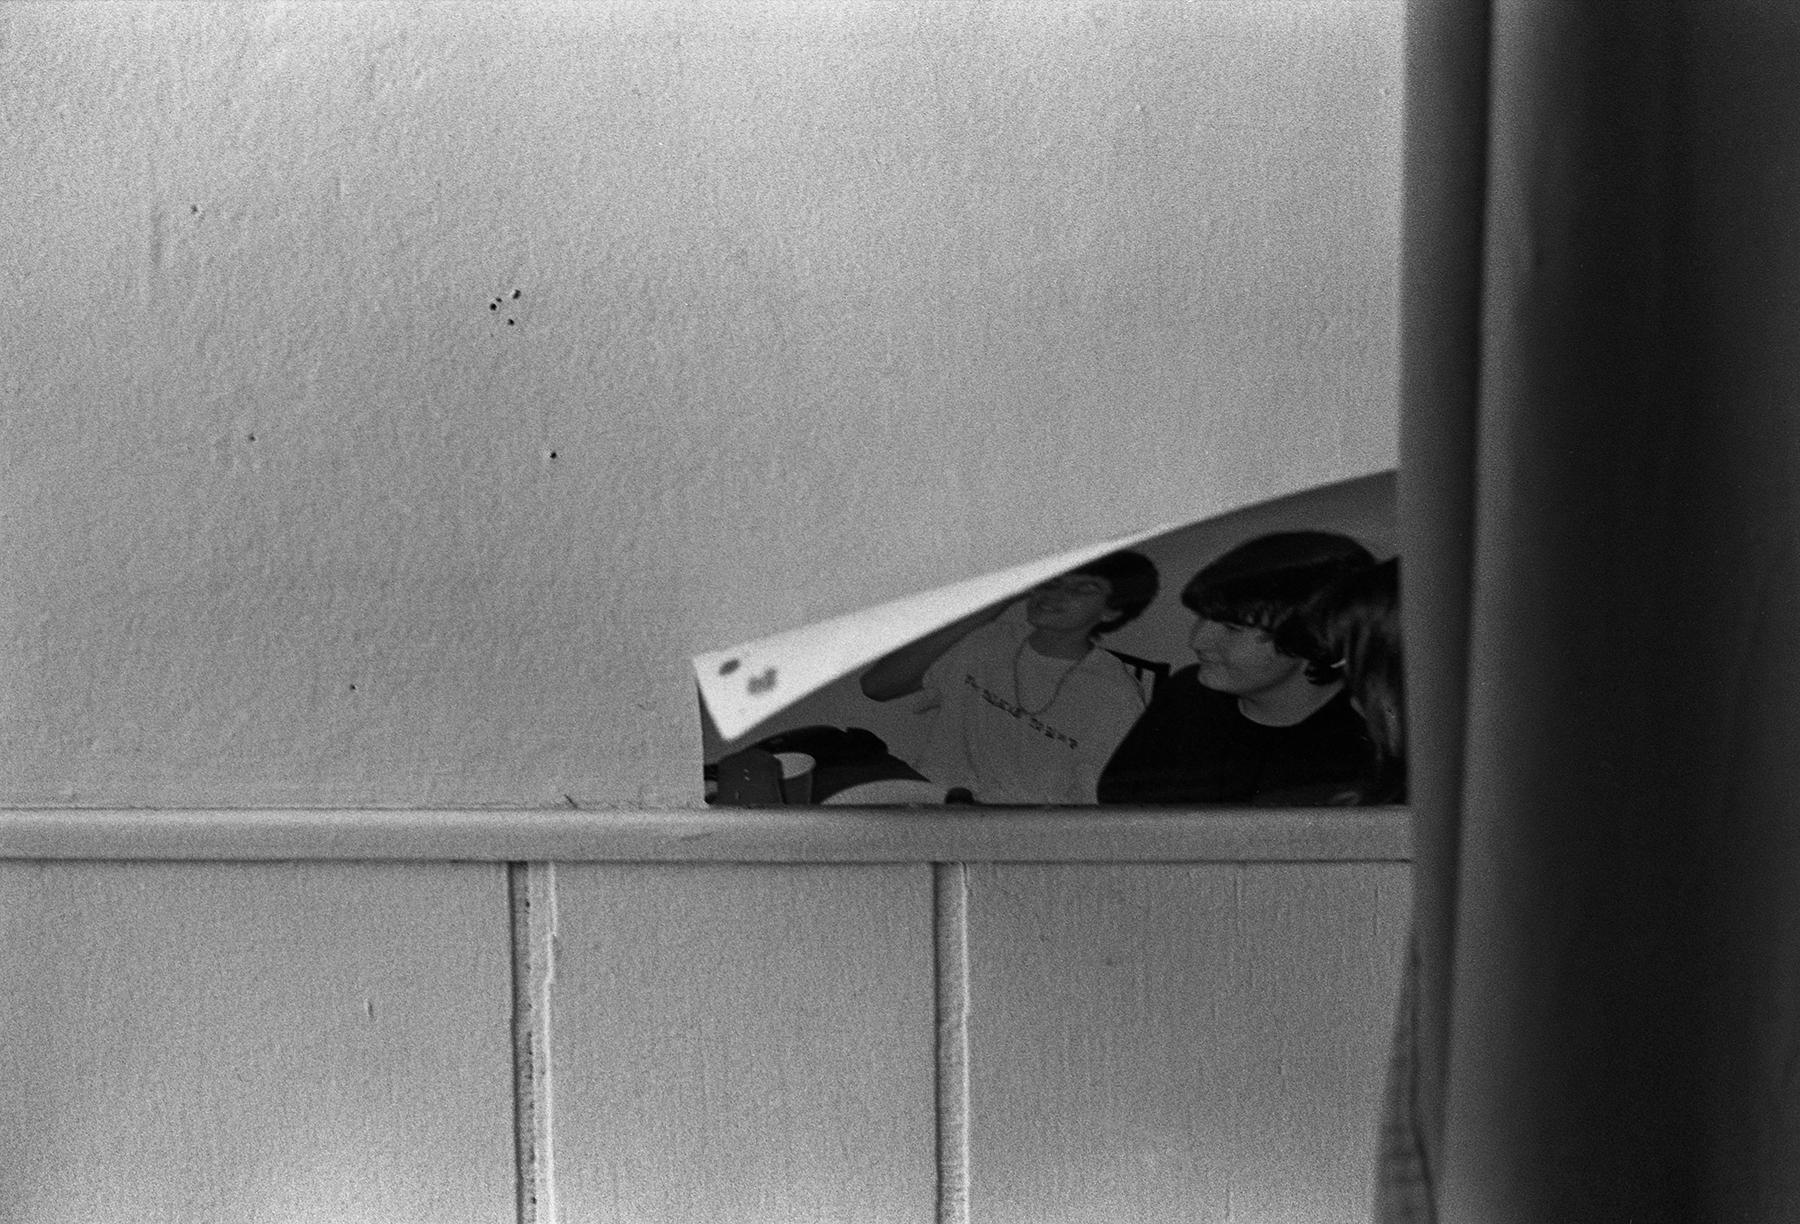 Darren Bilodeau,  P  eeling Photograph, silver gelatin print, 11x14, 2015